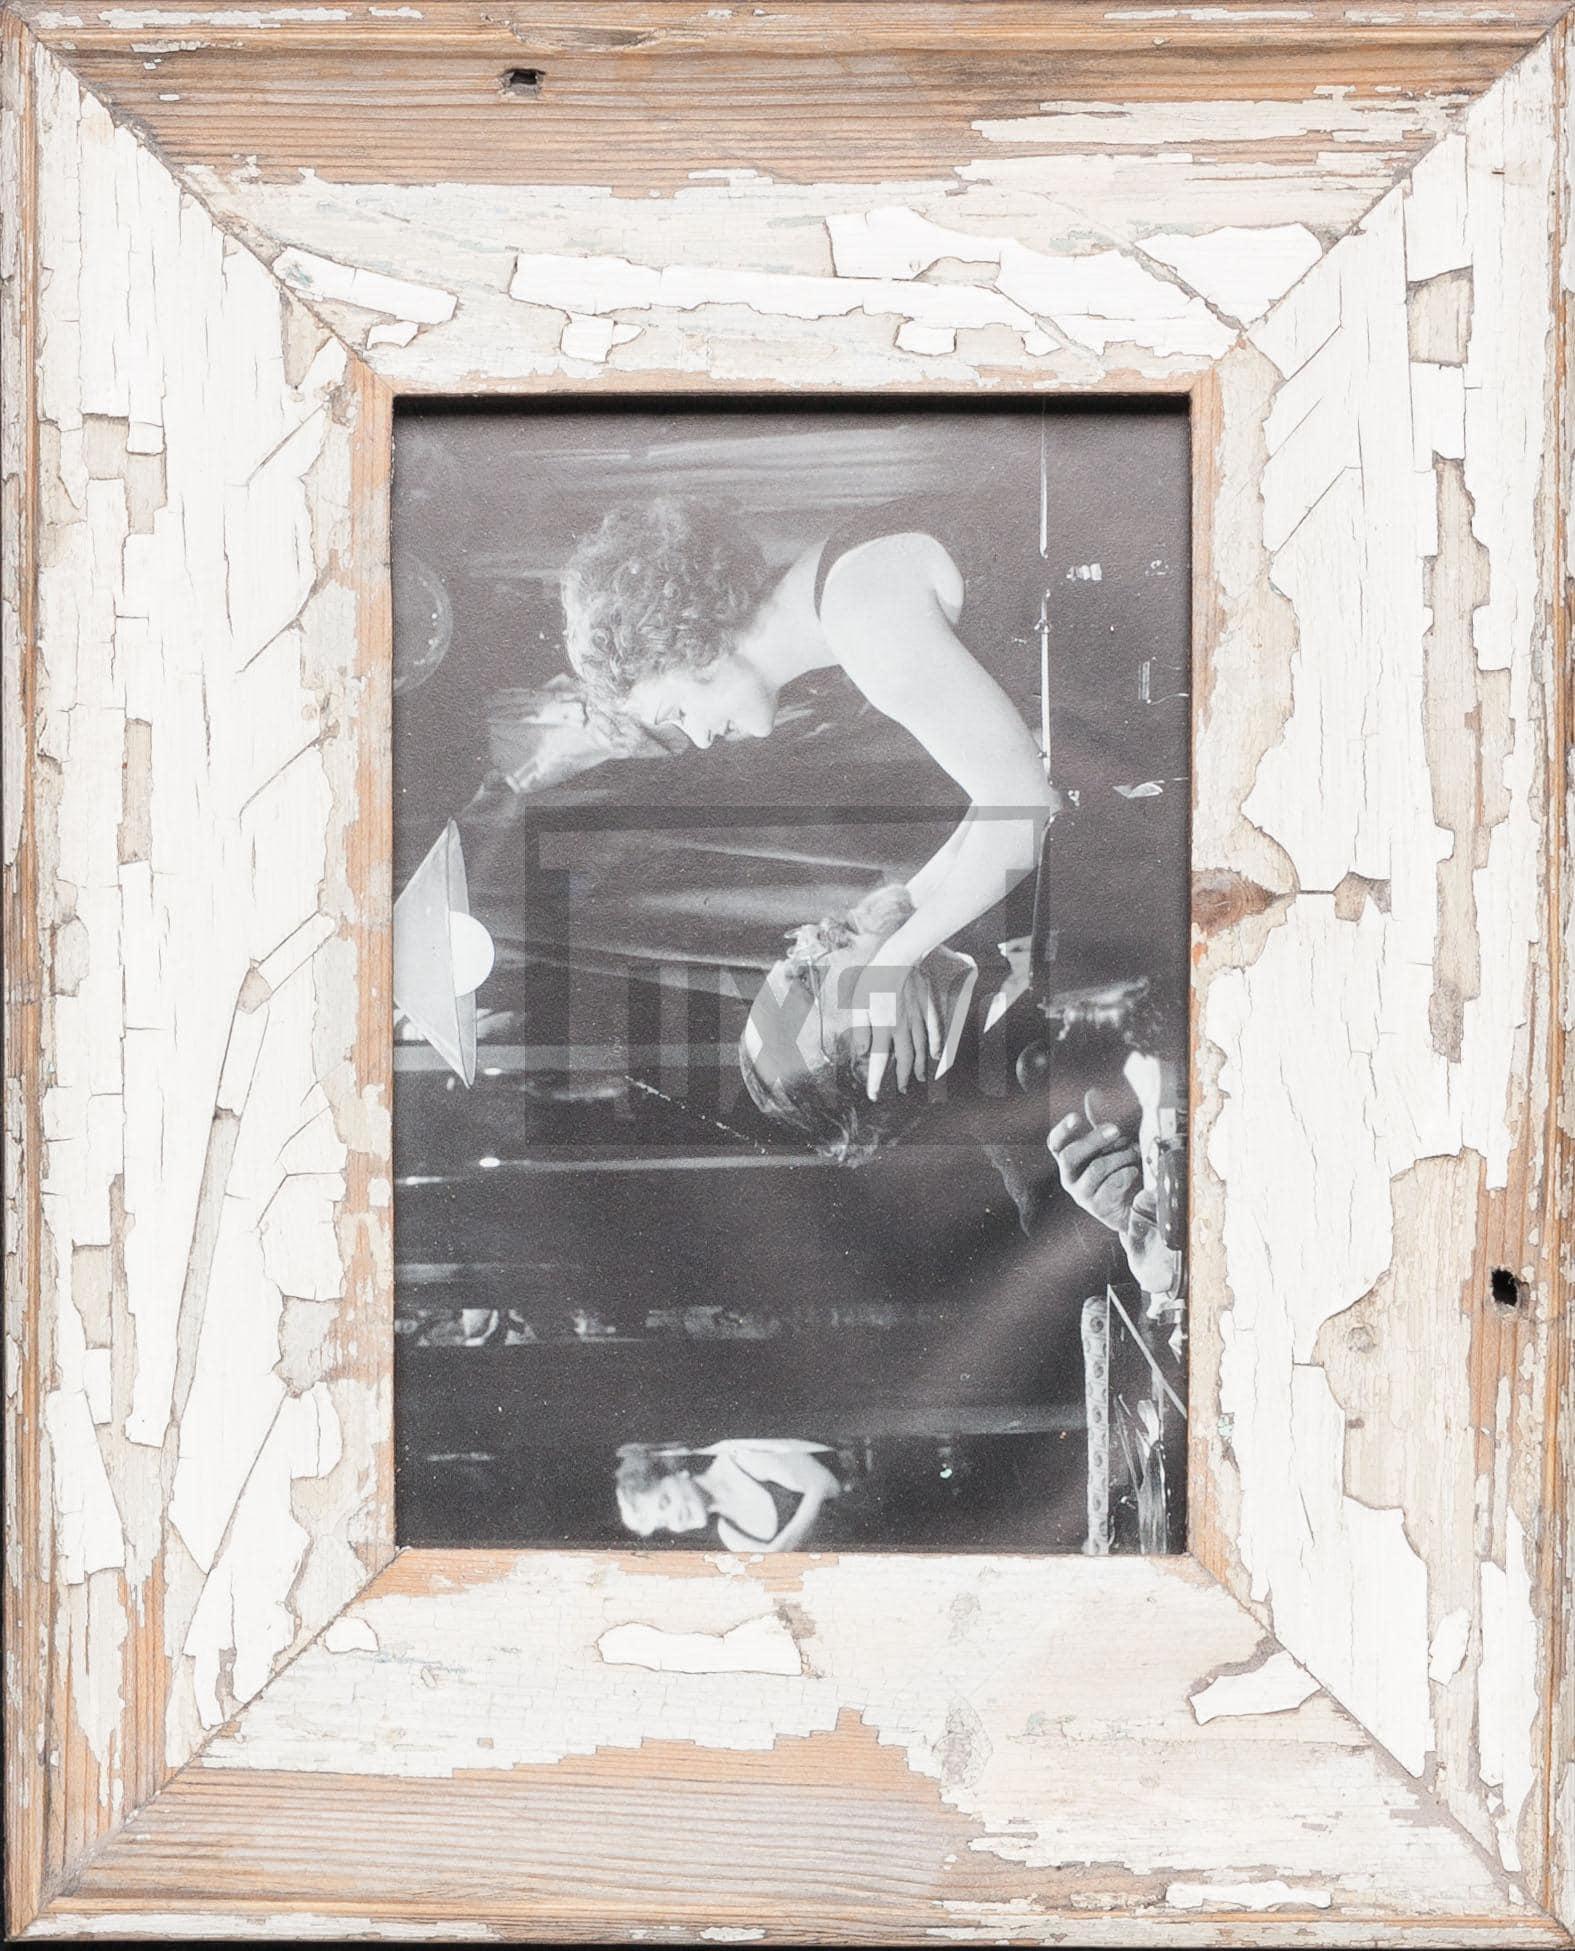 Vintage-Fotorahmen aus recyceltem Holz für Fotos DIN A5